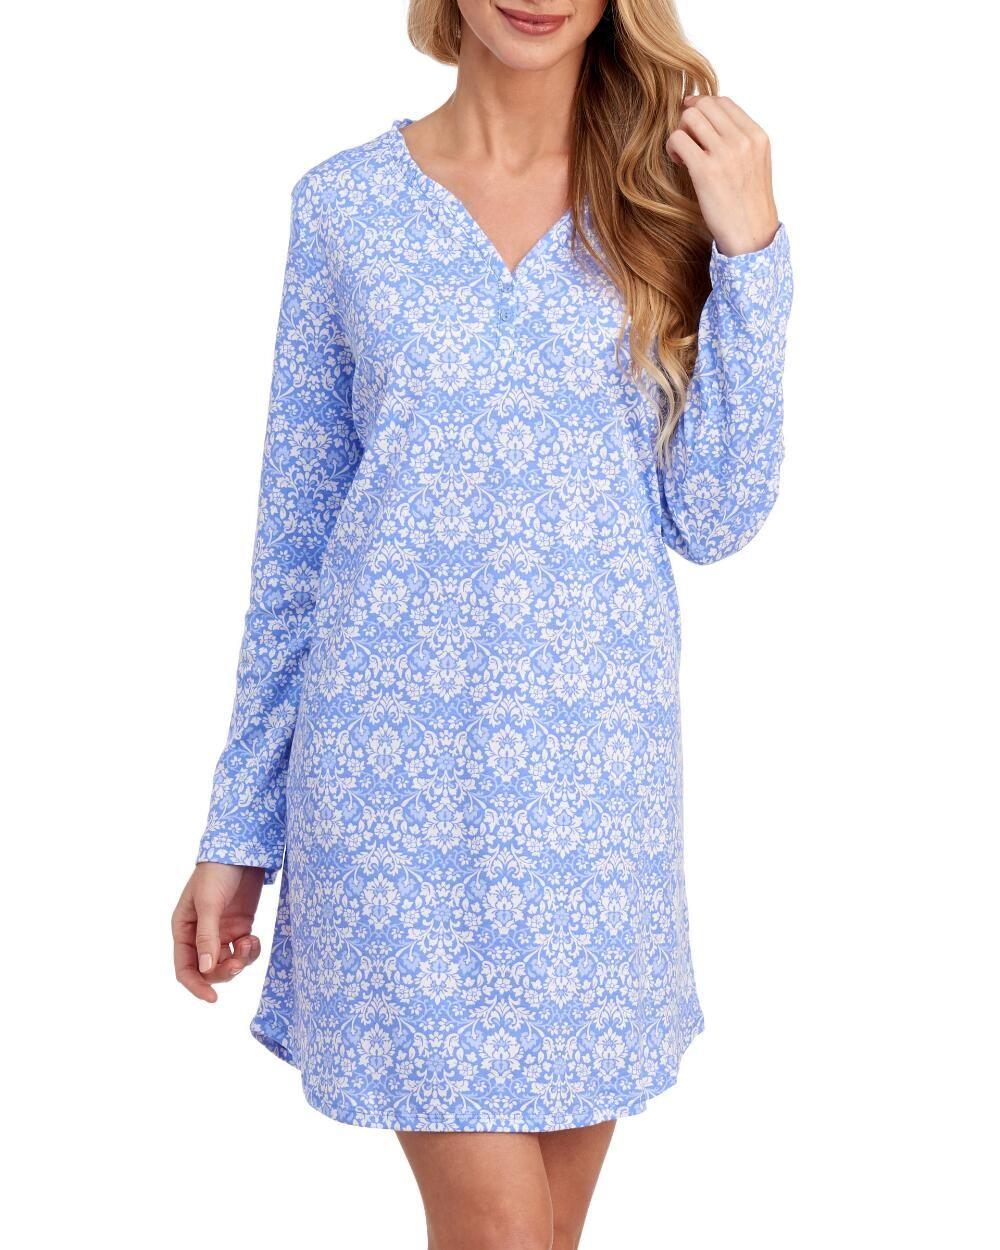 Karen Neuburger Encore Henley Nightshirt L Polyester Cotton Maternity Nursing Dress Nursing Dress Casual Dress [ 1250 x 1000 Pixel ]